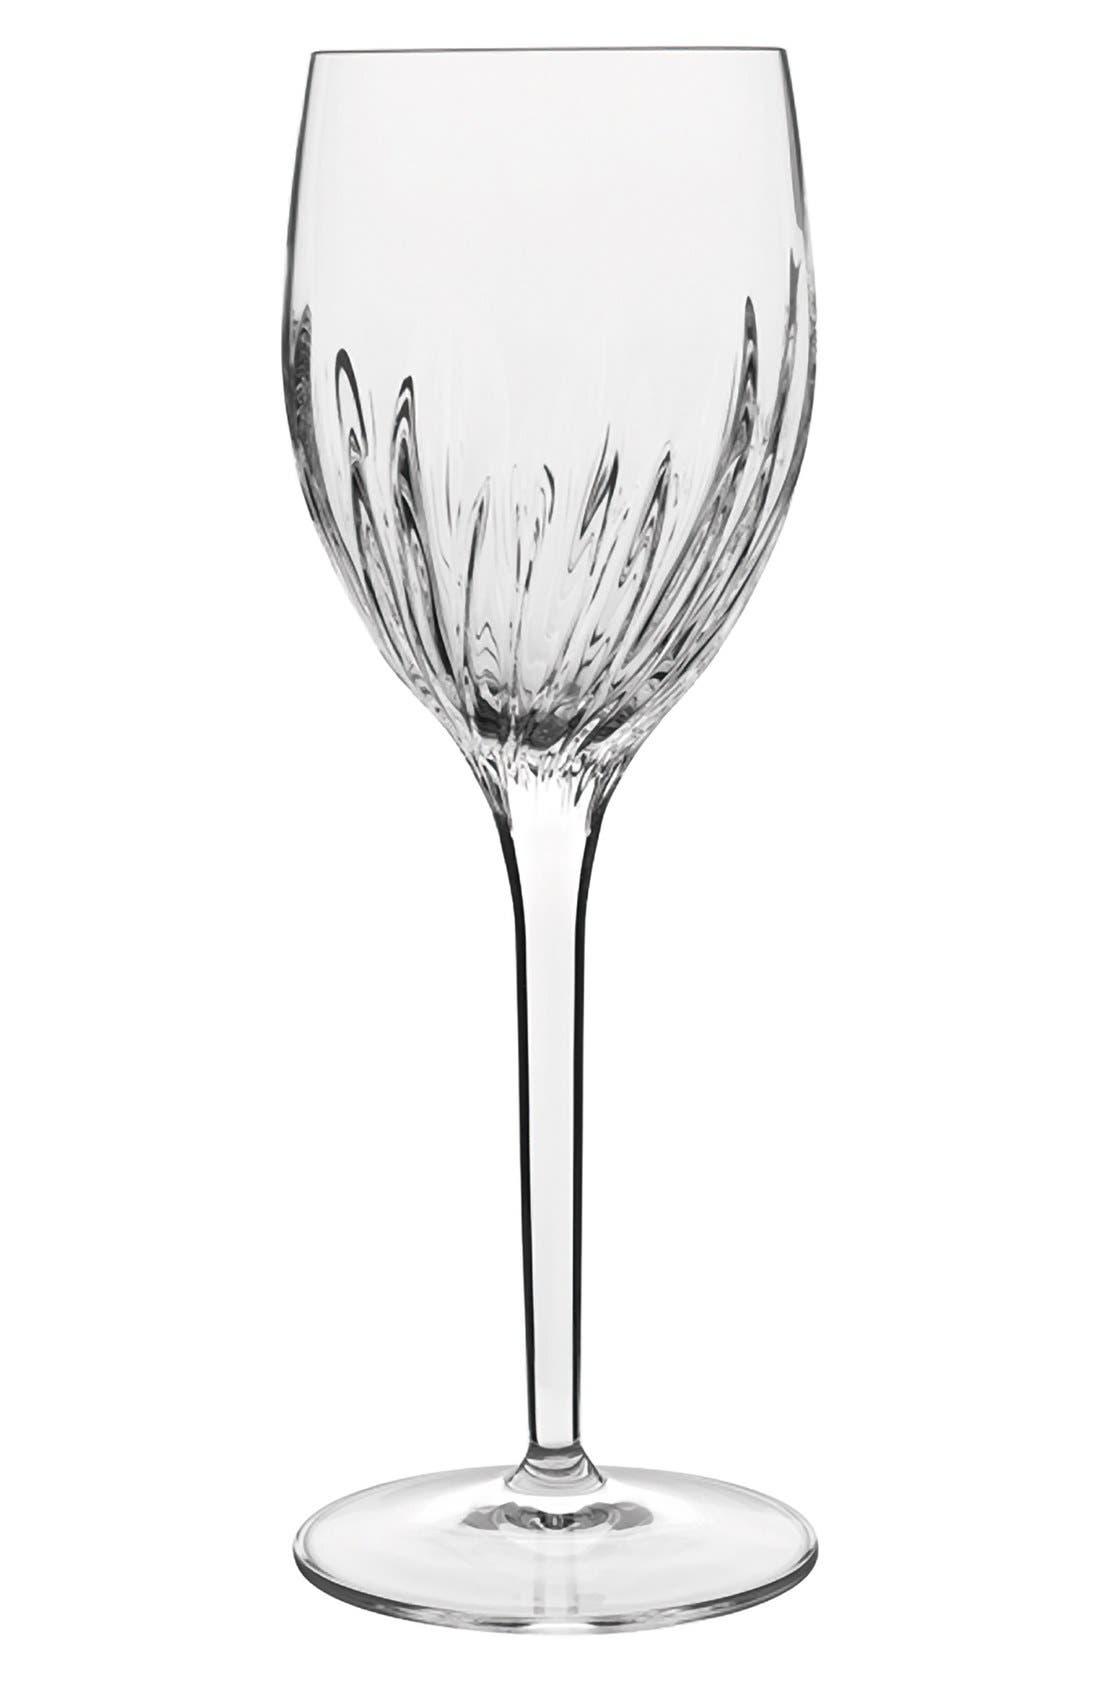 Incanto Set of 4 White Wine Glasses,                             Main thumbnail 1, color,                             000